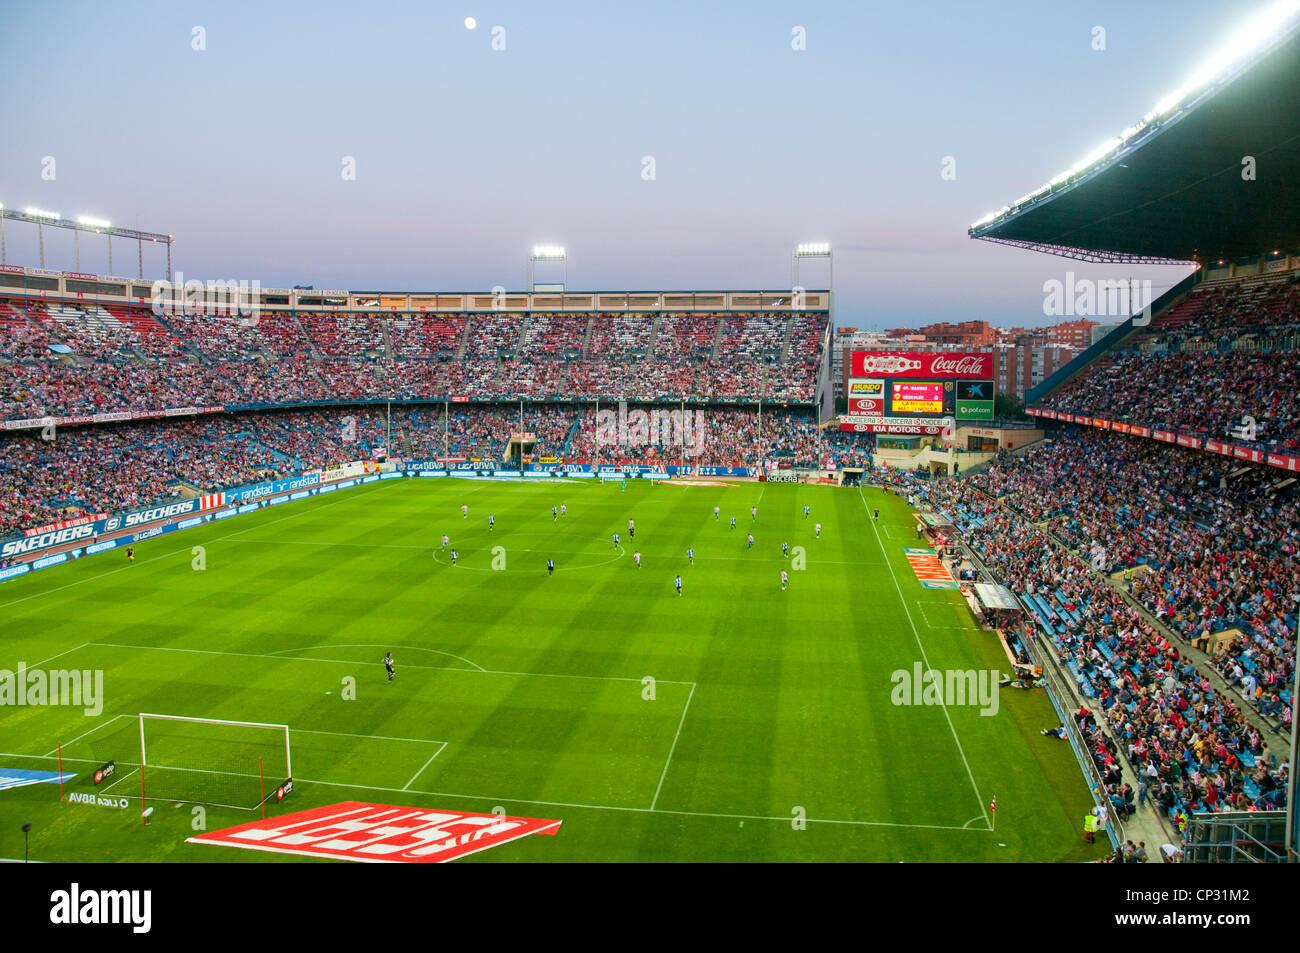 Vicente Calderon stadium during the Atletico de Madrid-Hercules CF football match, night view. Madrid, Spain. - Stock Image